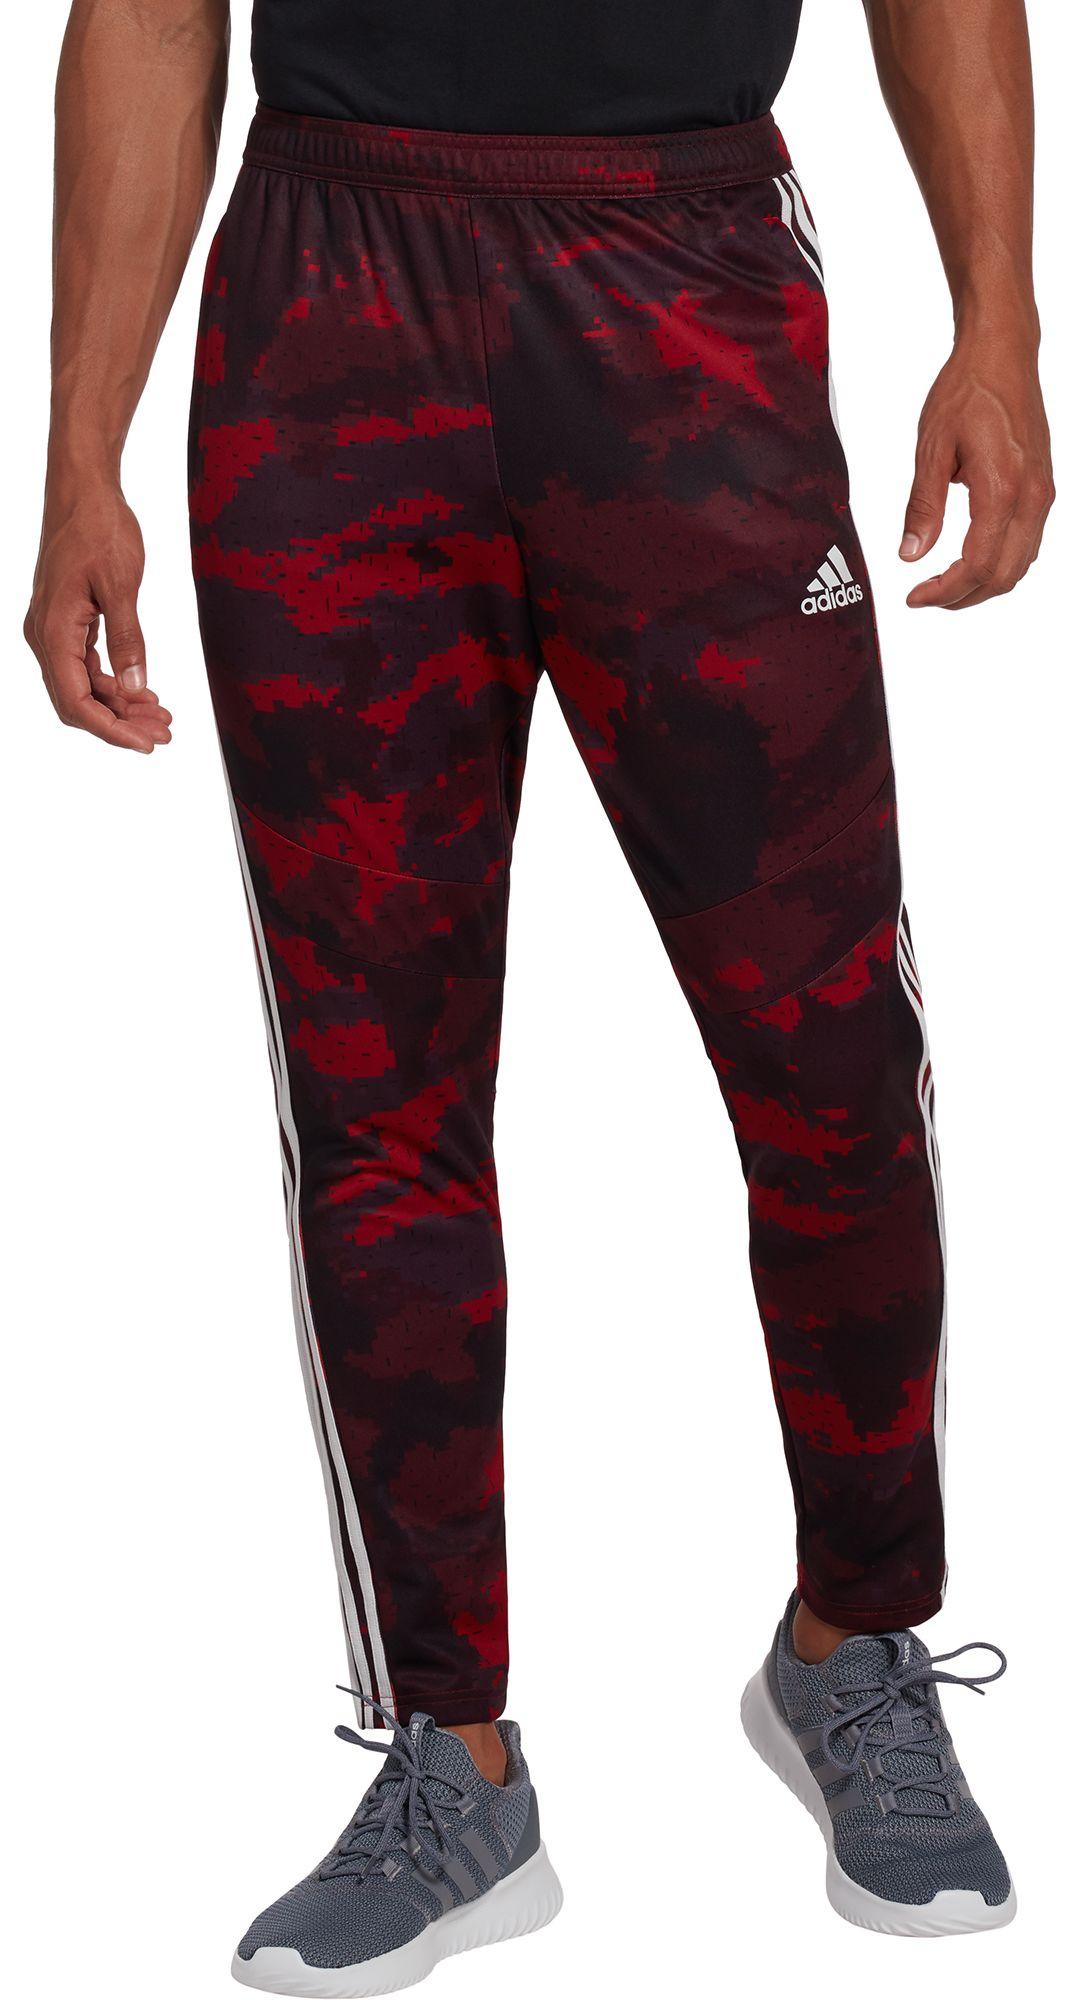 7b897be5107b6 adidas Men's Tiro 19 Camo Training Pants